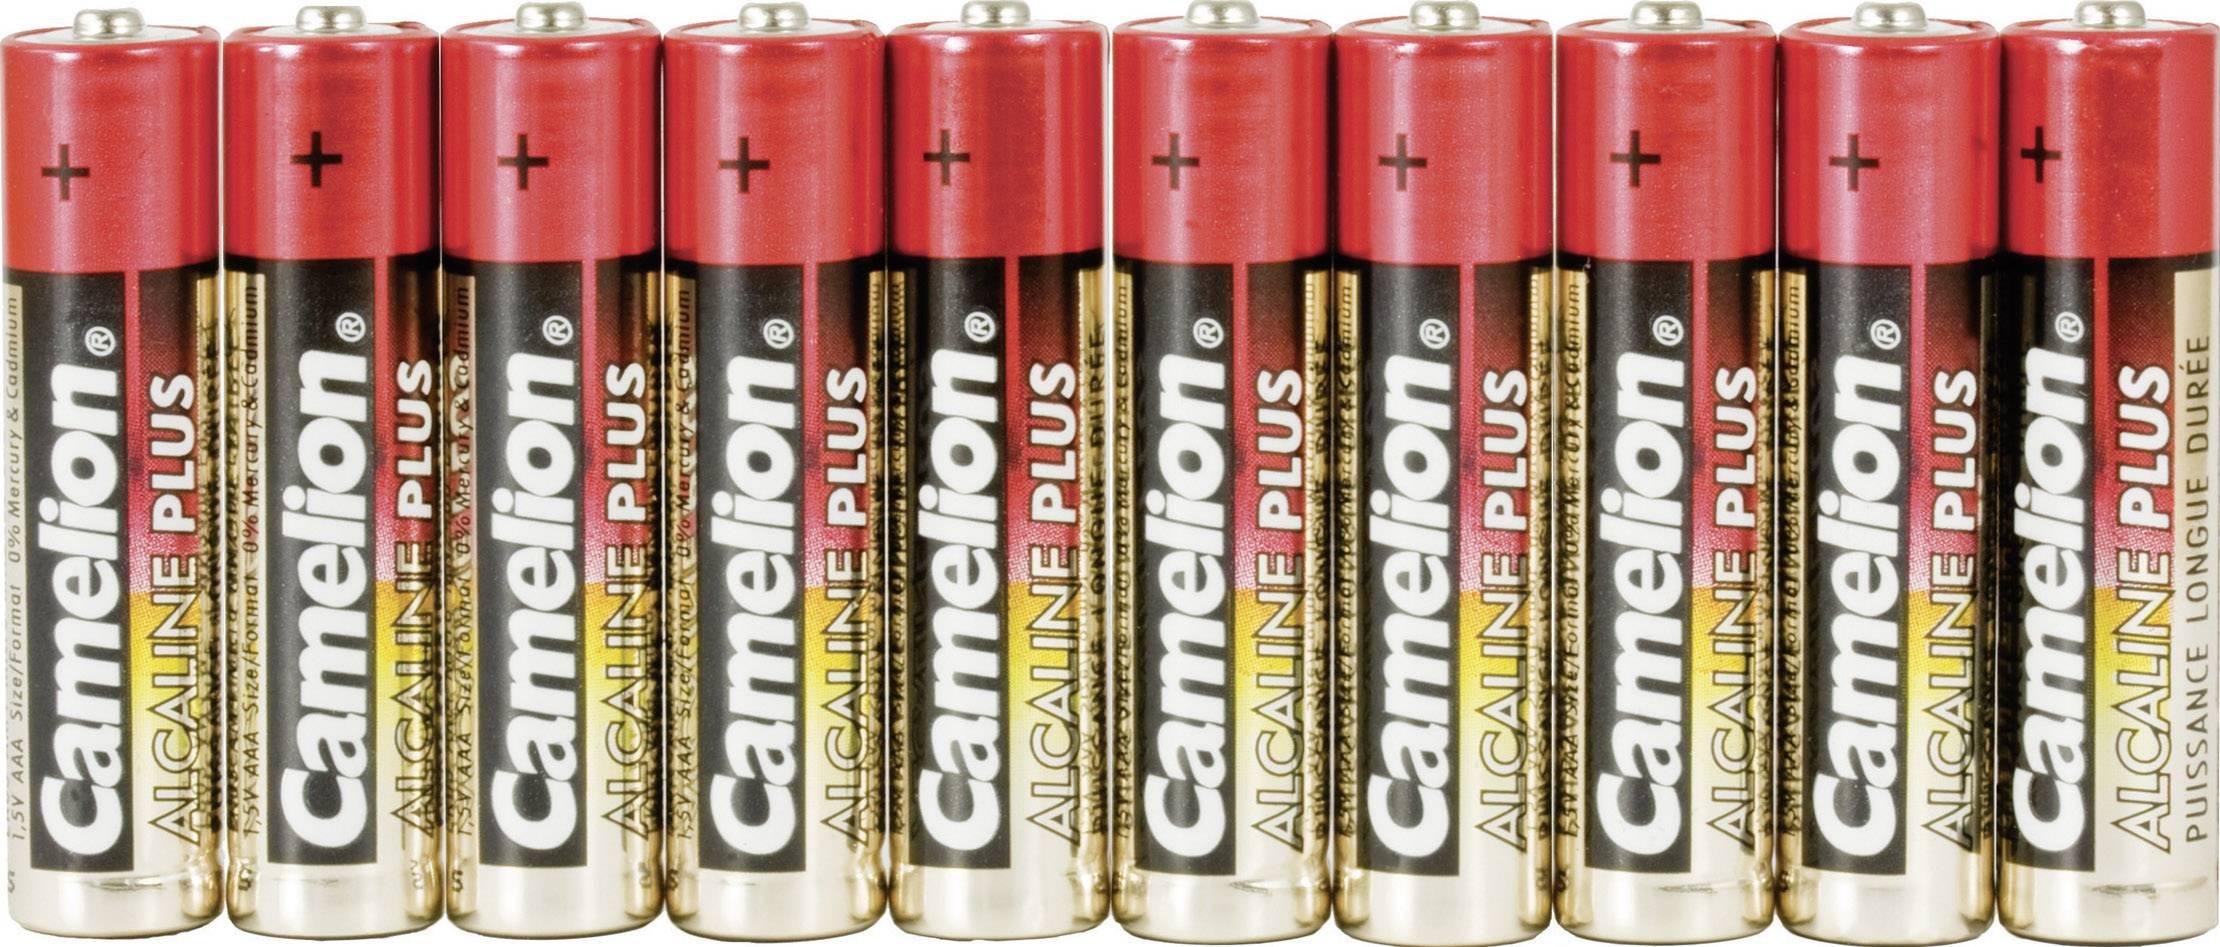 Alkalická/manganová baterie, typ AAA, sada 10 ks